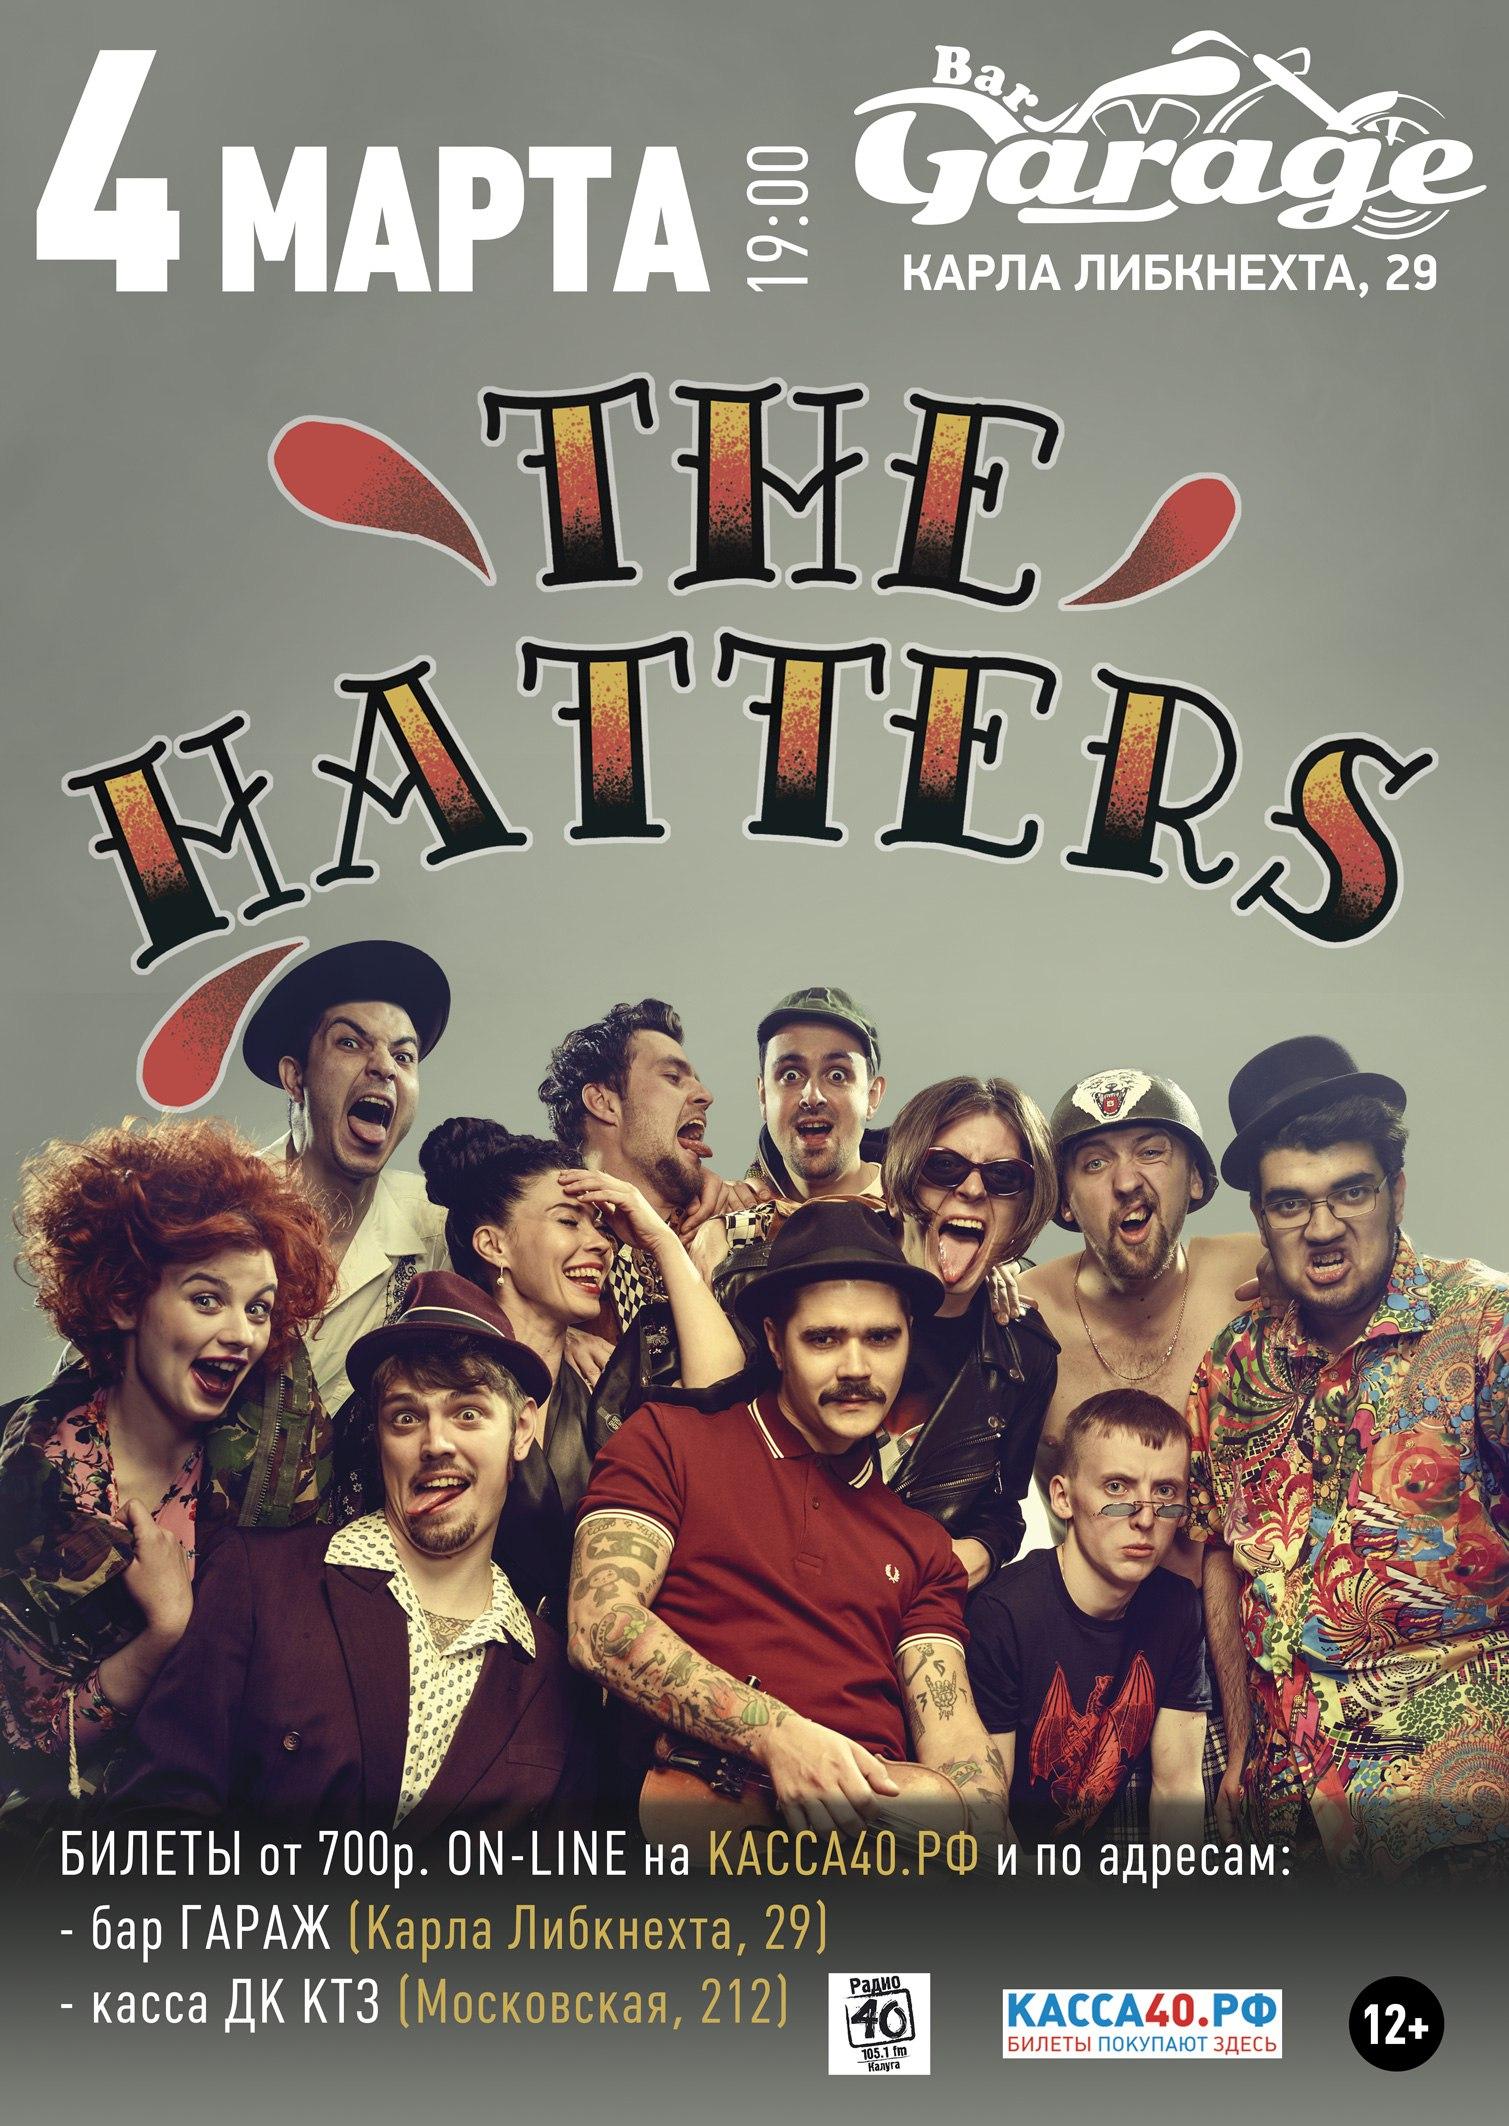 THE HATTERS. Bar Garage